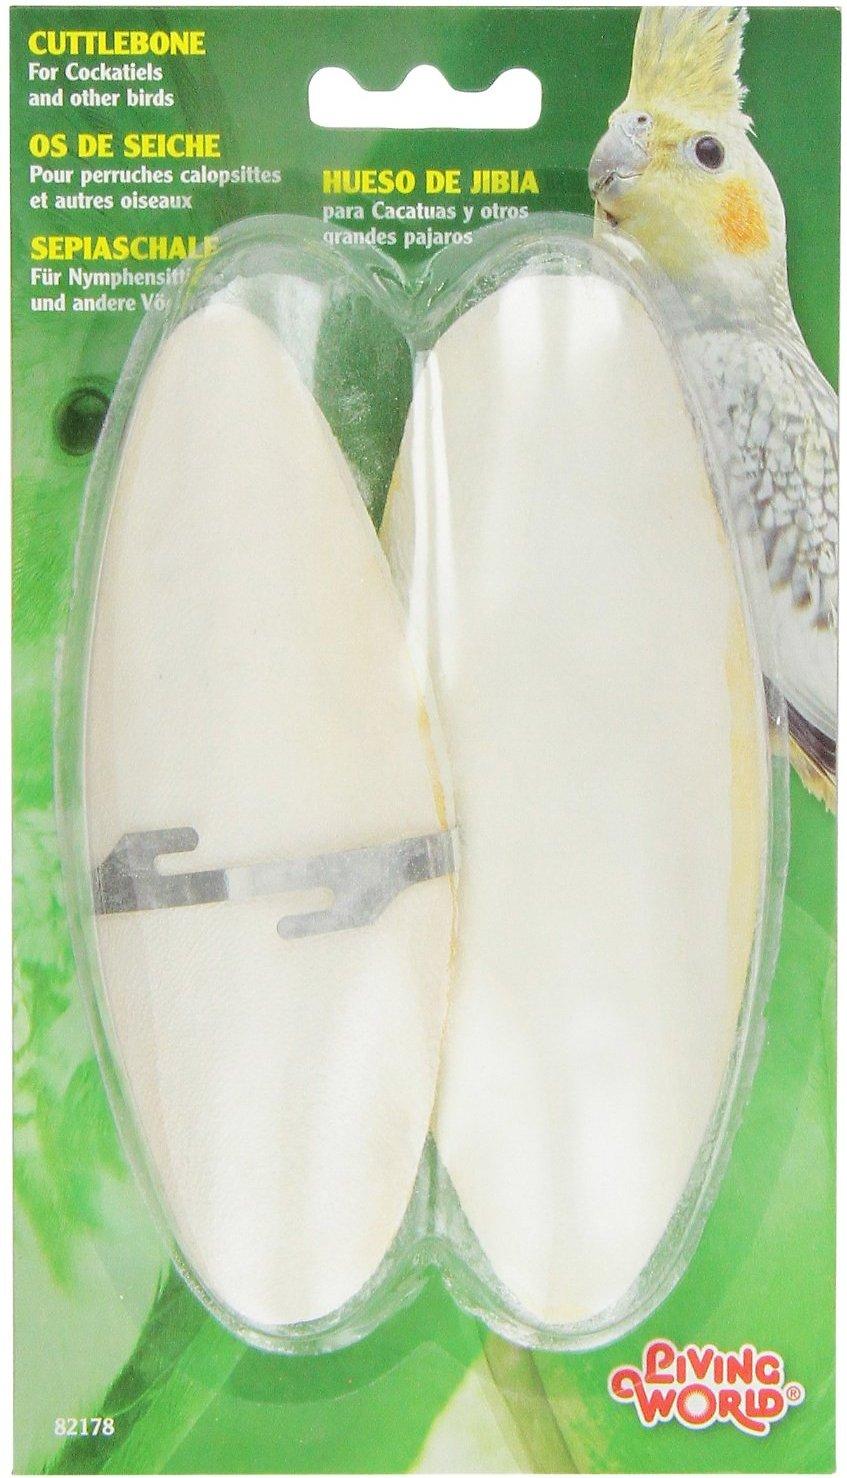 Living World Cuttlebone Bird Treat Image